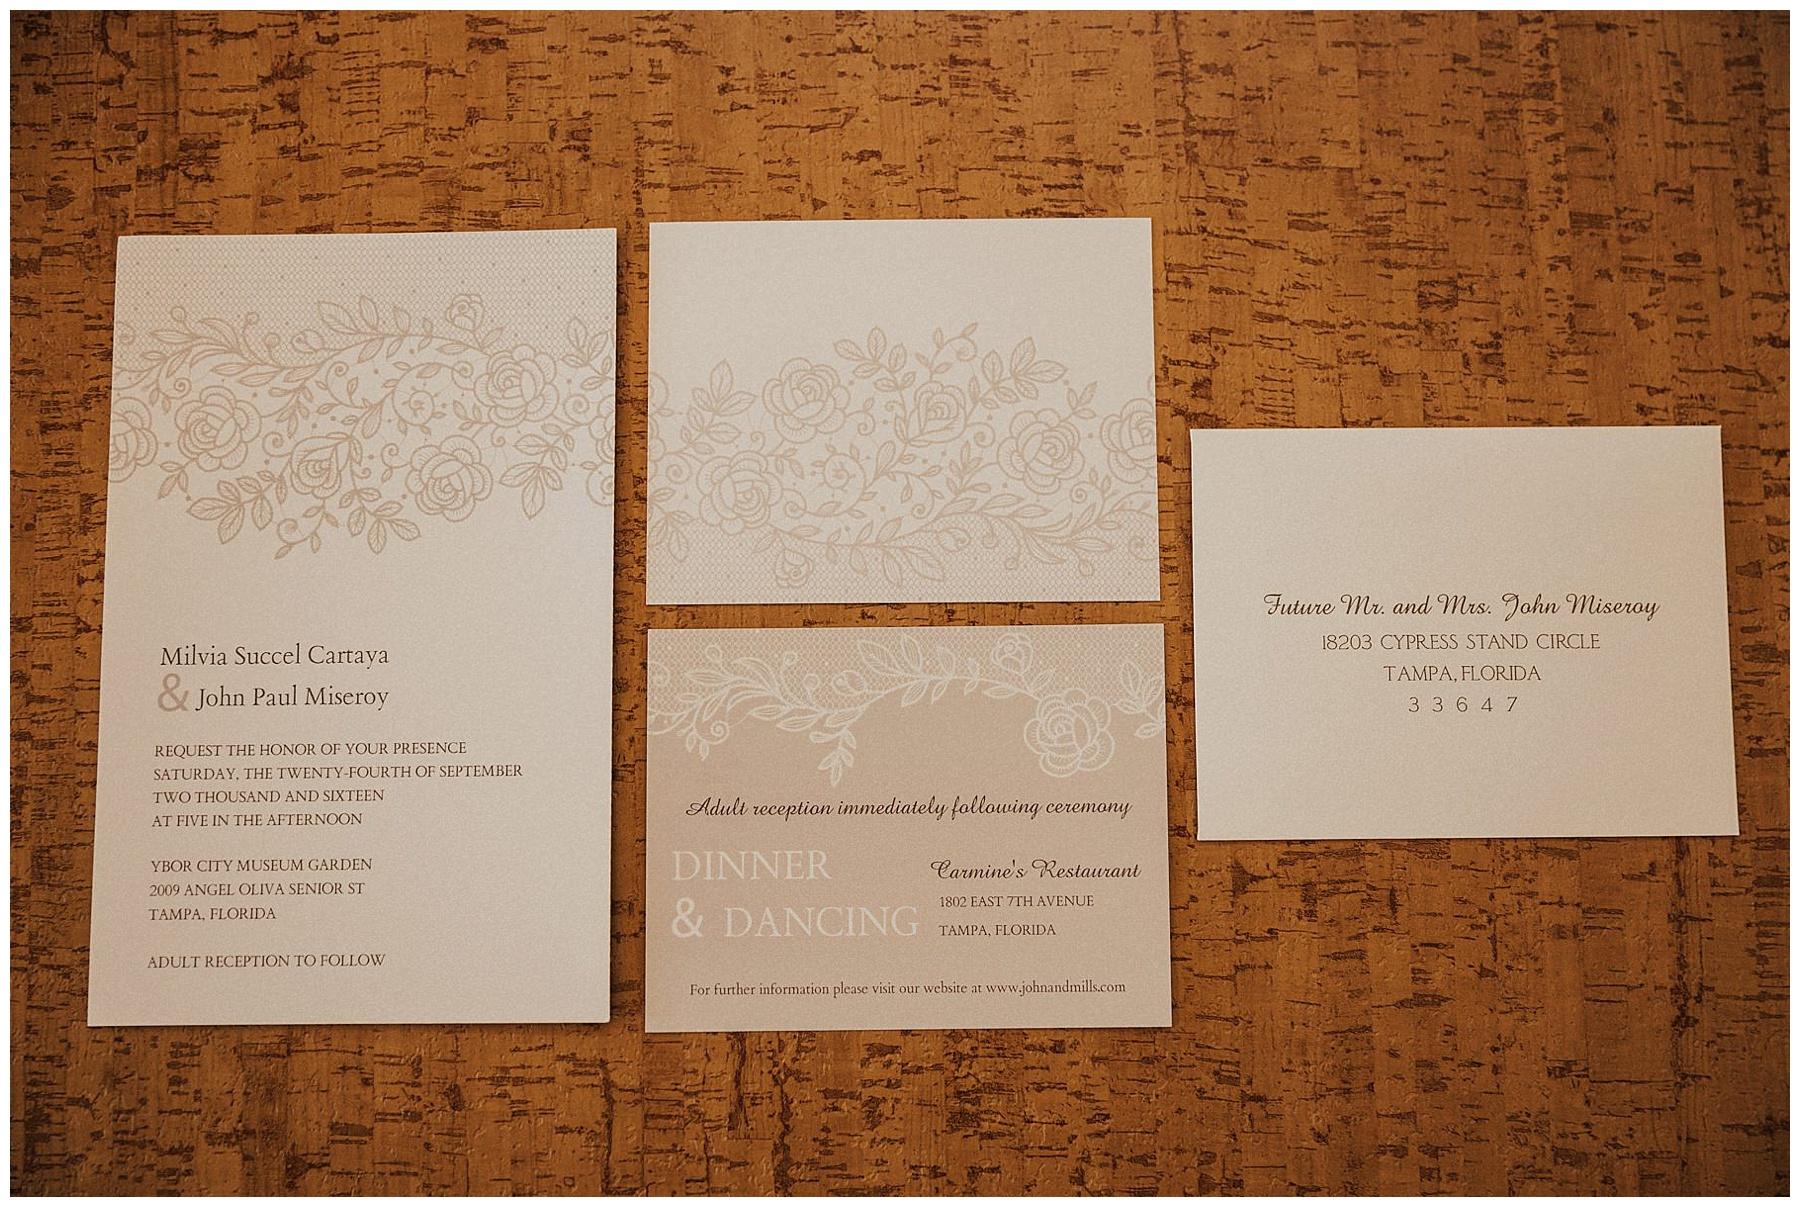 YBOR Wedding Tampa Wedding Photographer-4.jpg